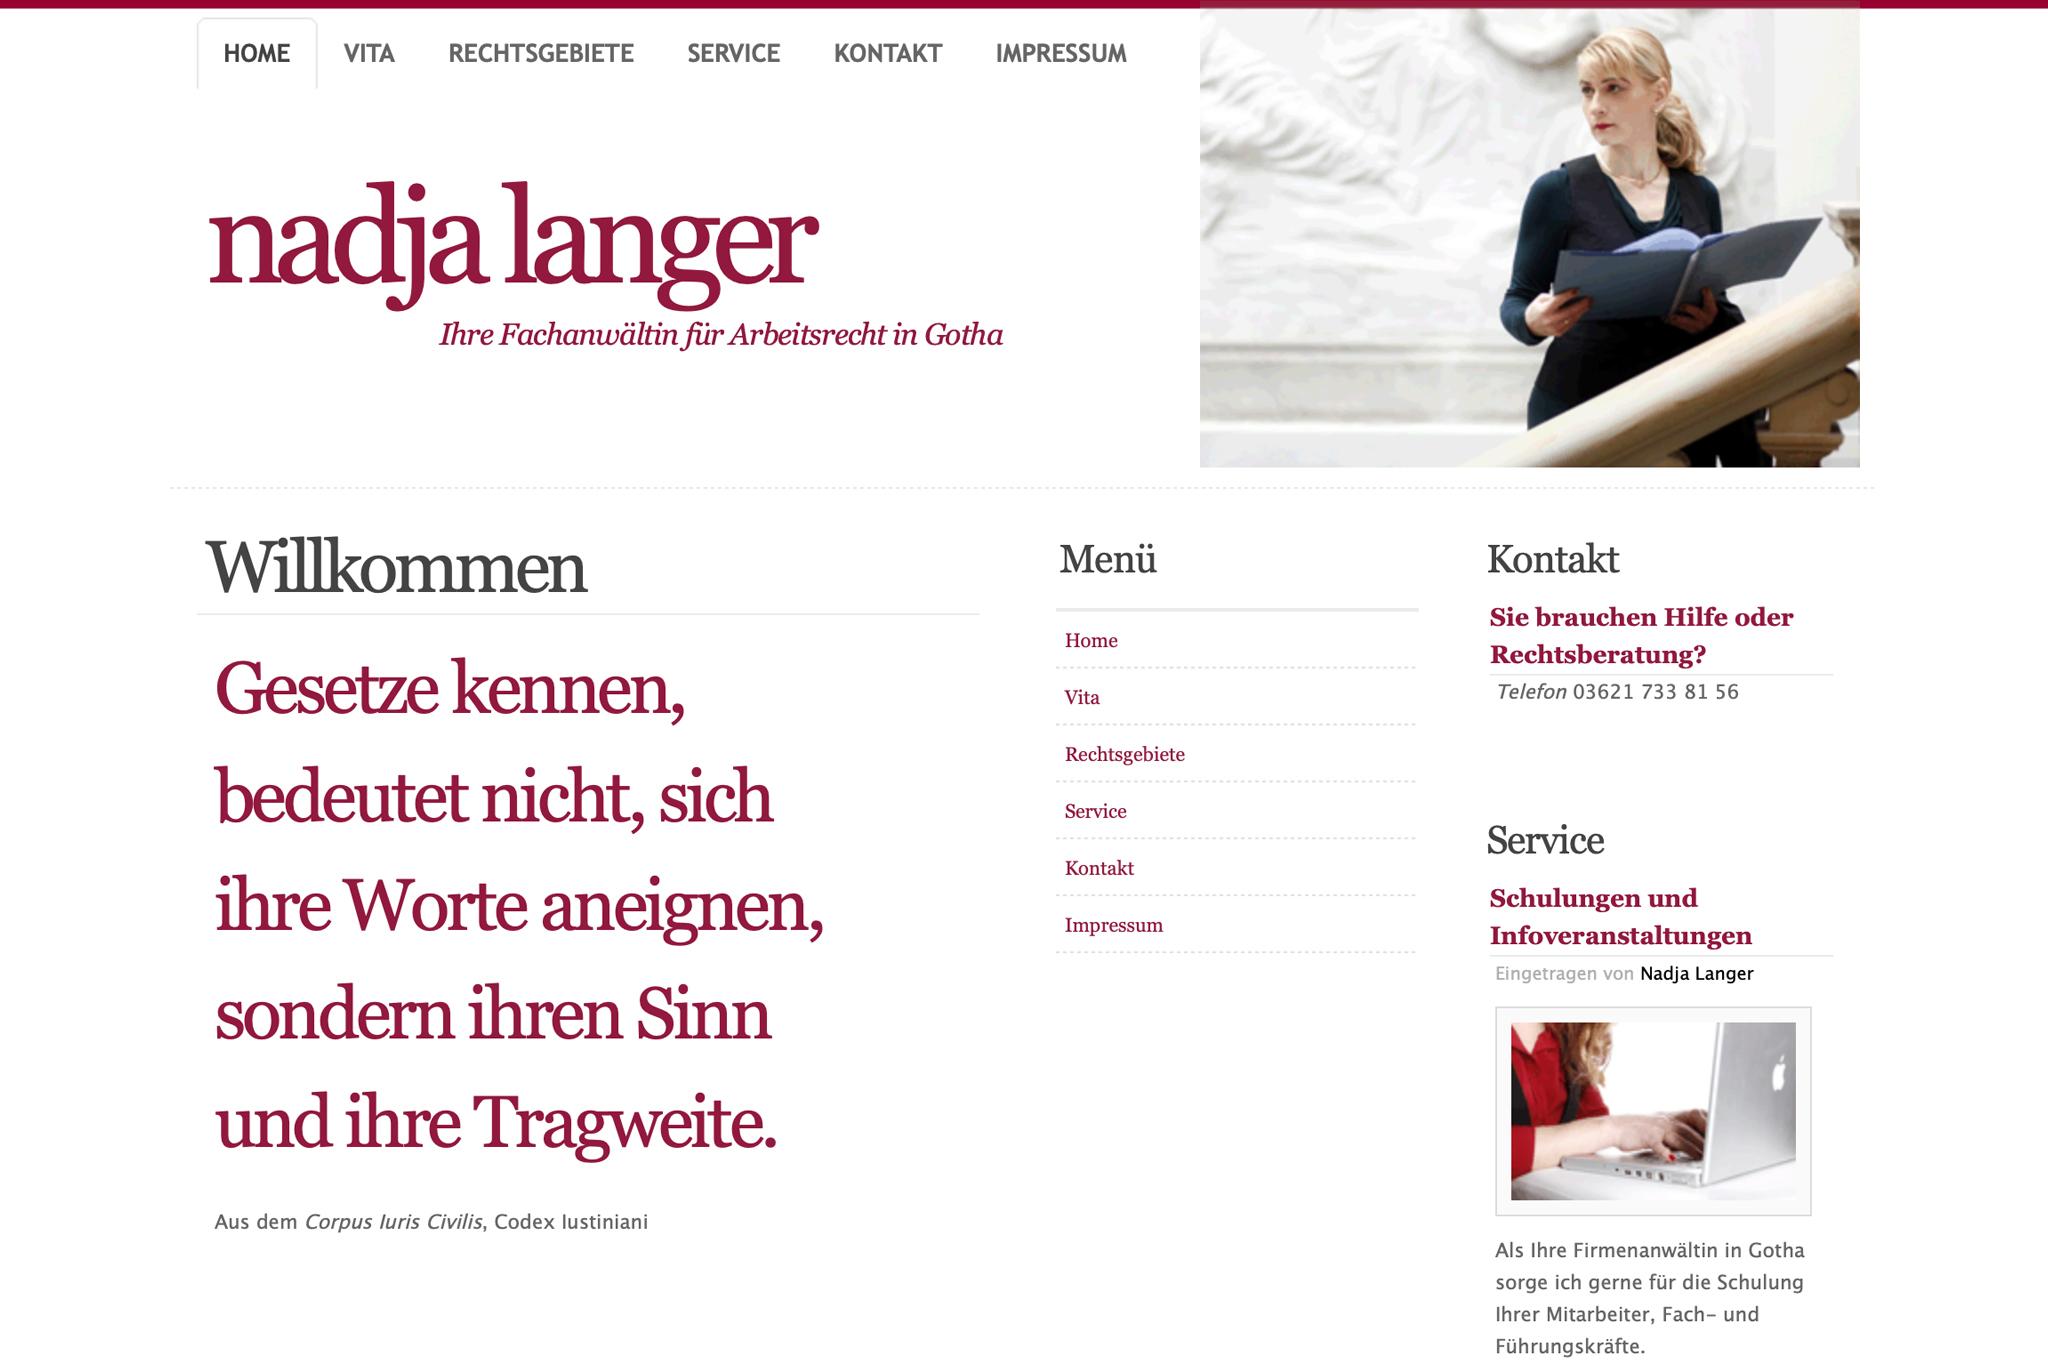 RA Nadja Langer, Gotha | Design: Johannes Willwacher